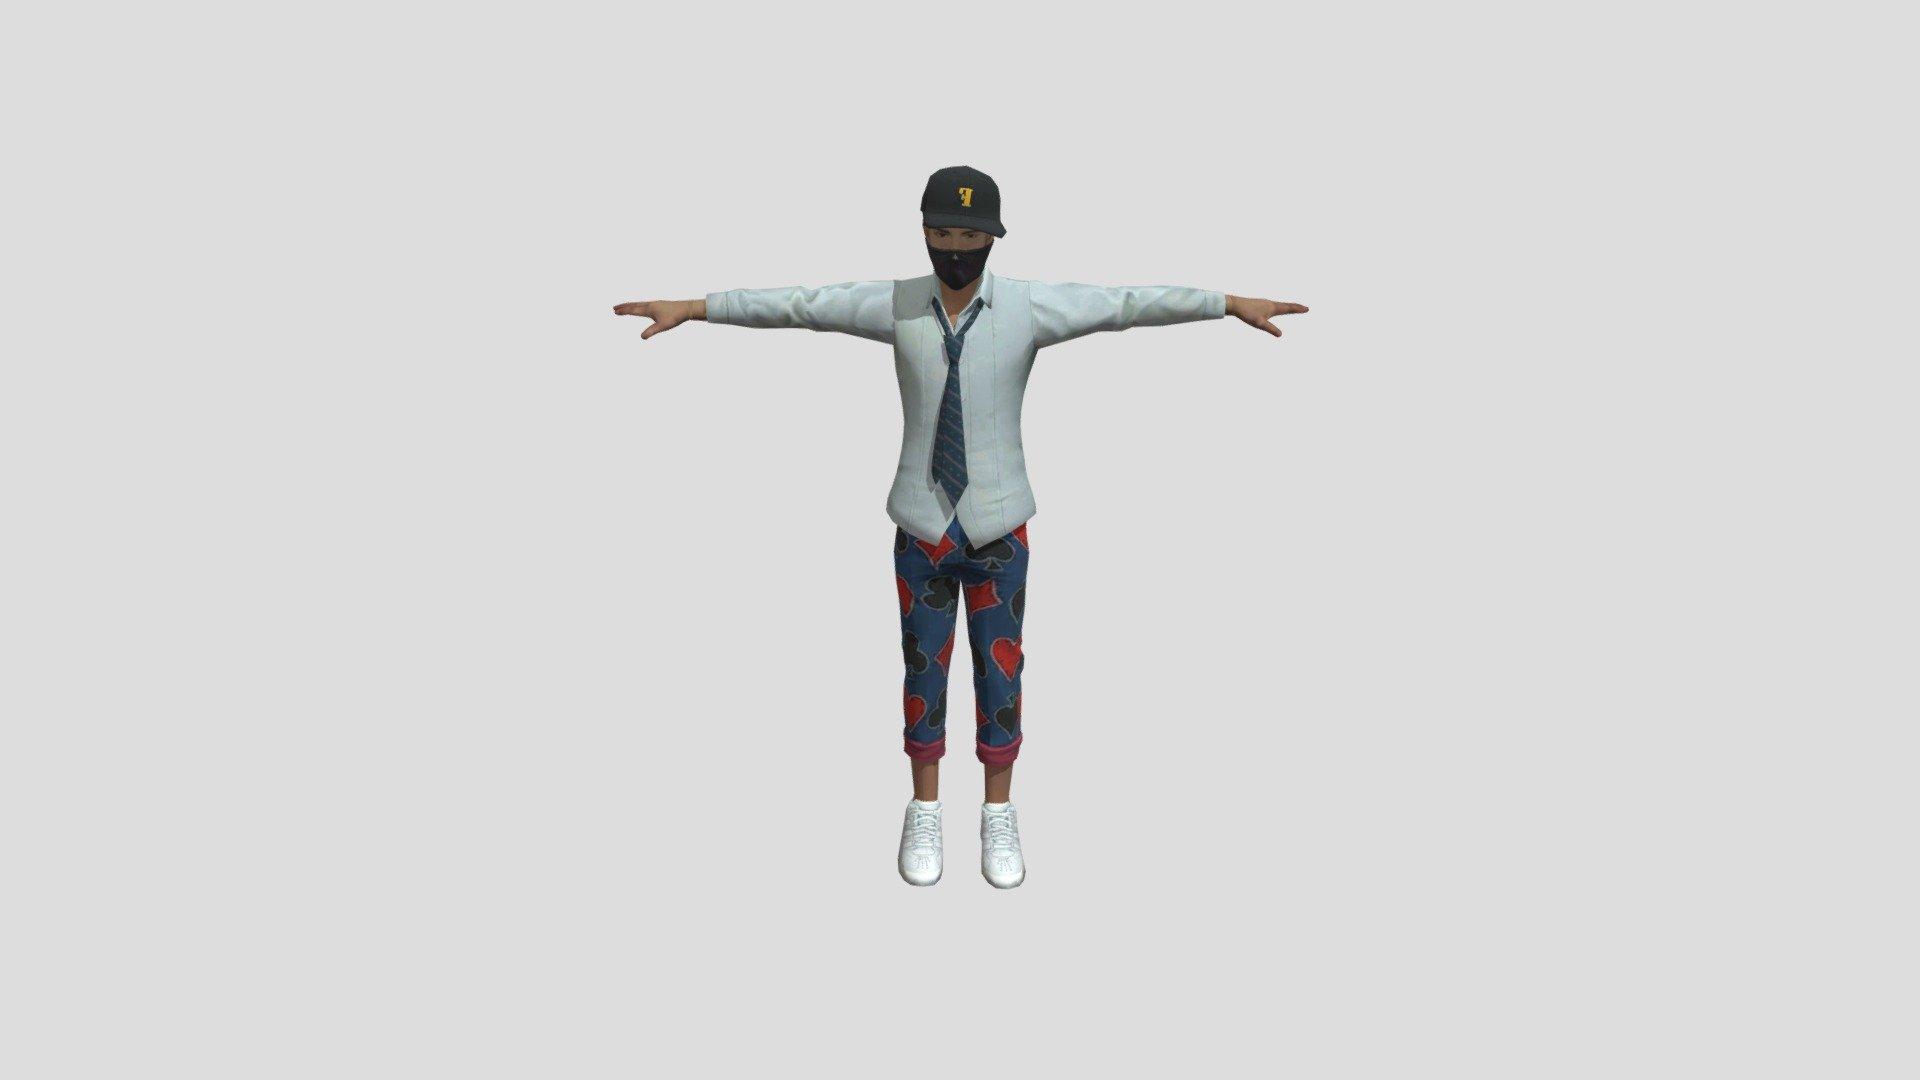 free download Unreal Engine Marketplace - FurryS1: Fantasy